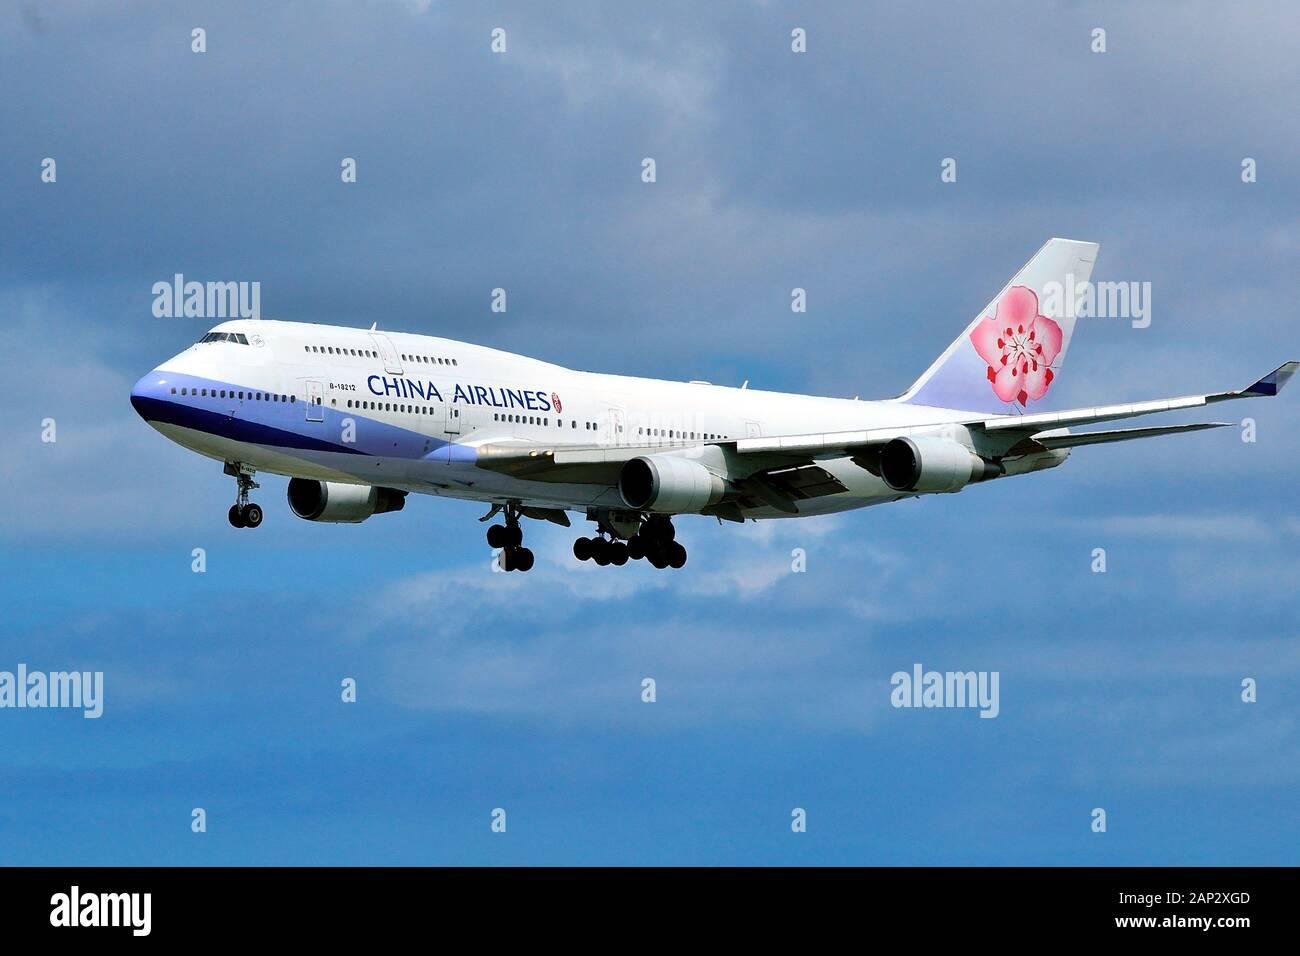 China Airlines Boeing B-747-400, B-18210, Approach Landing at Naha Airport, Okinawa, Ryukyu Islands, Japan Stock Photo